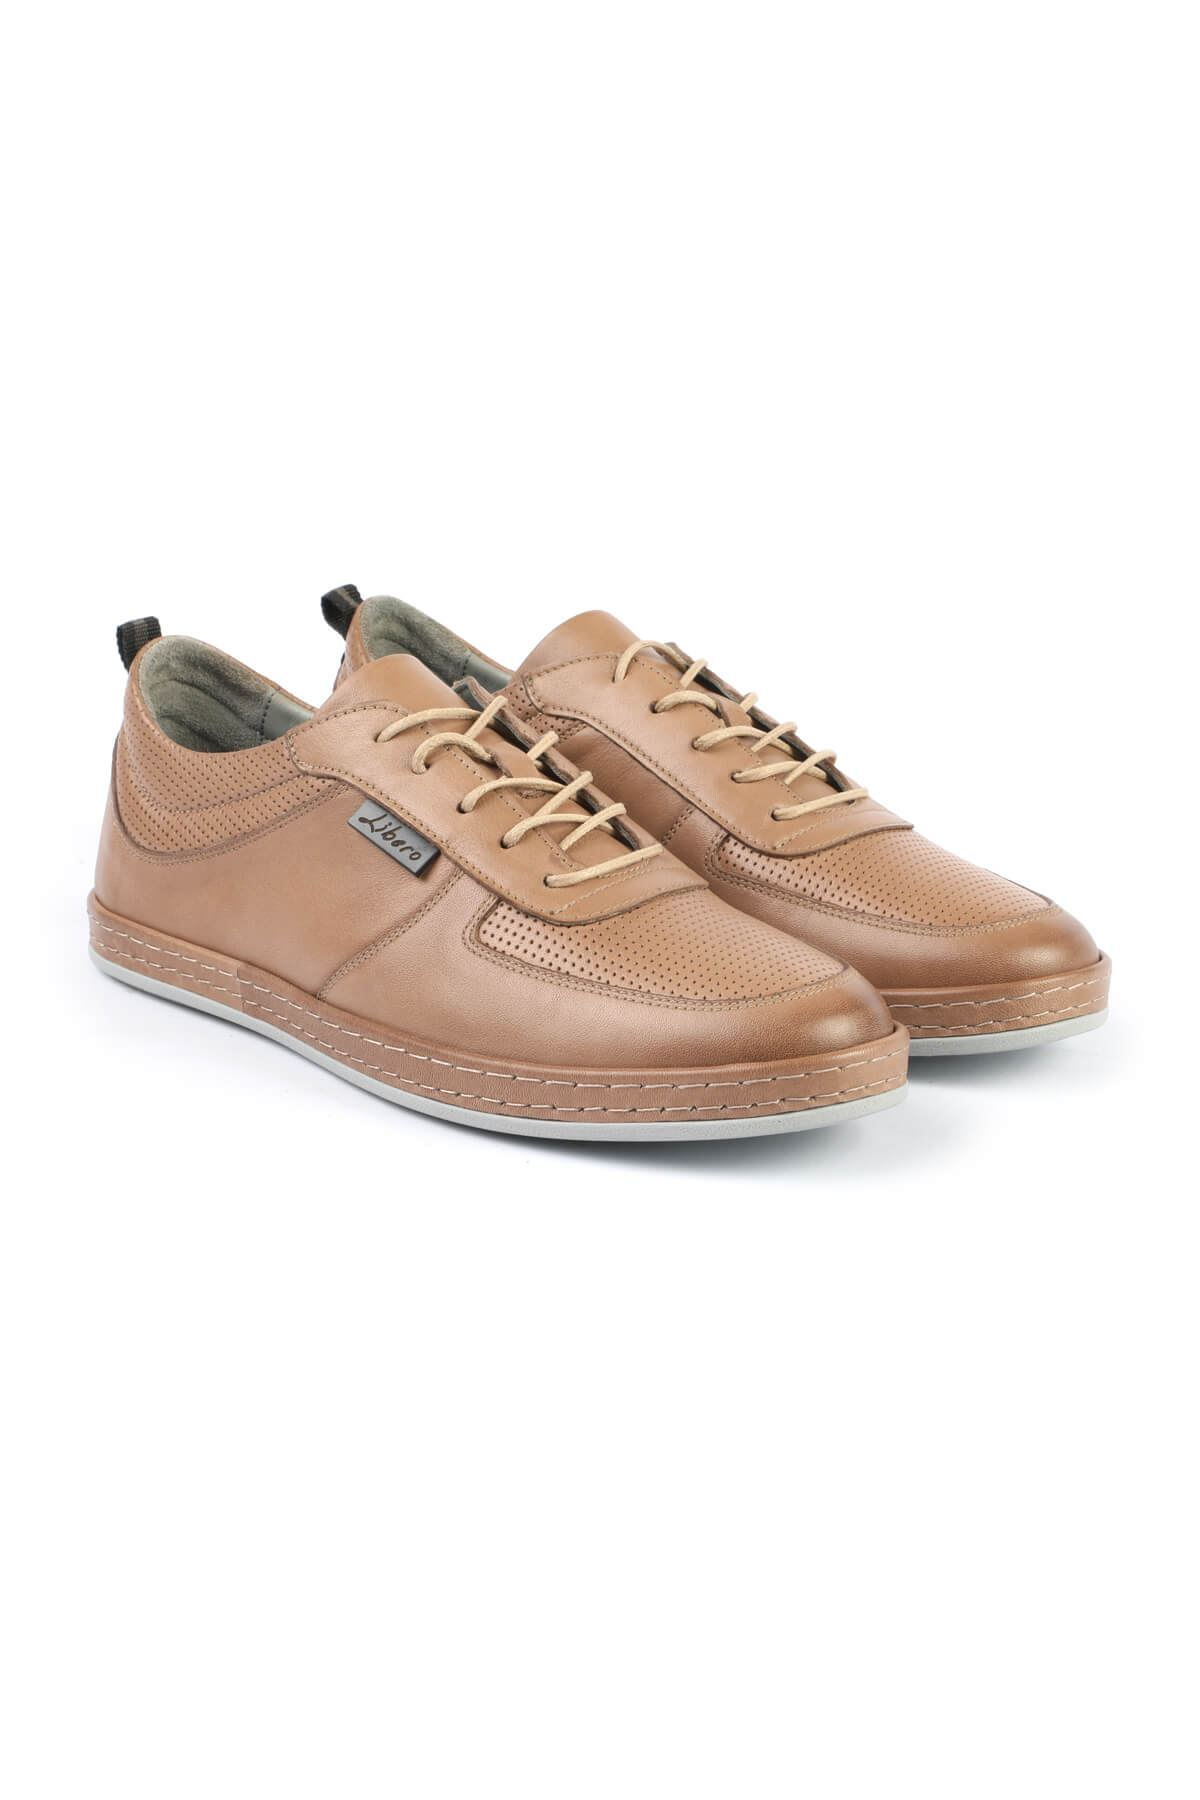 Libero 3063 Mink Sport Shoes